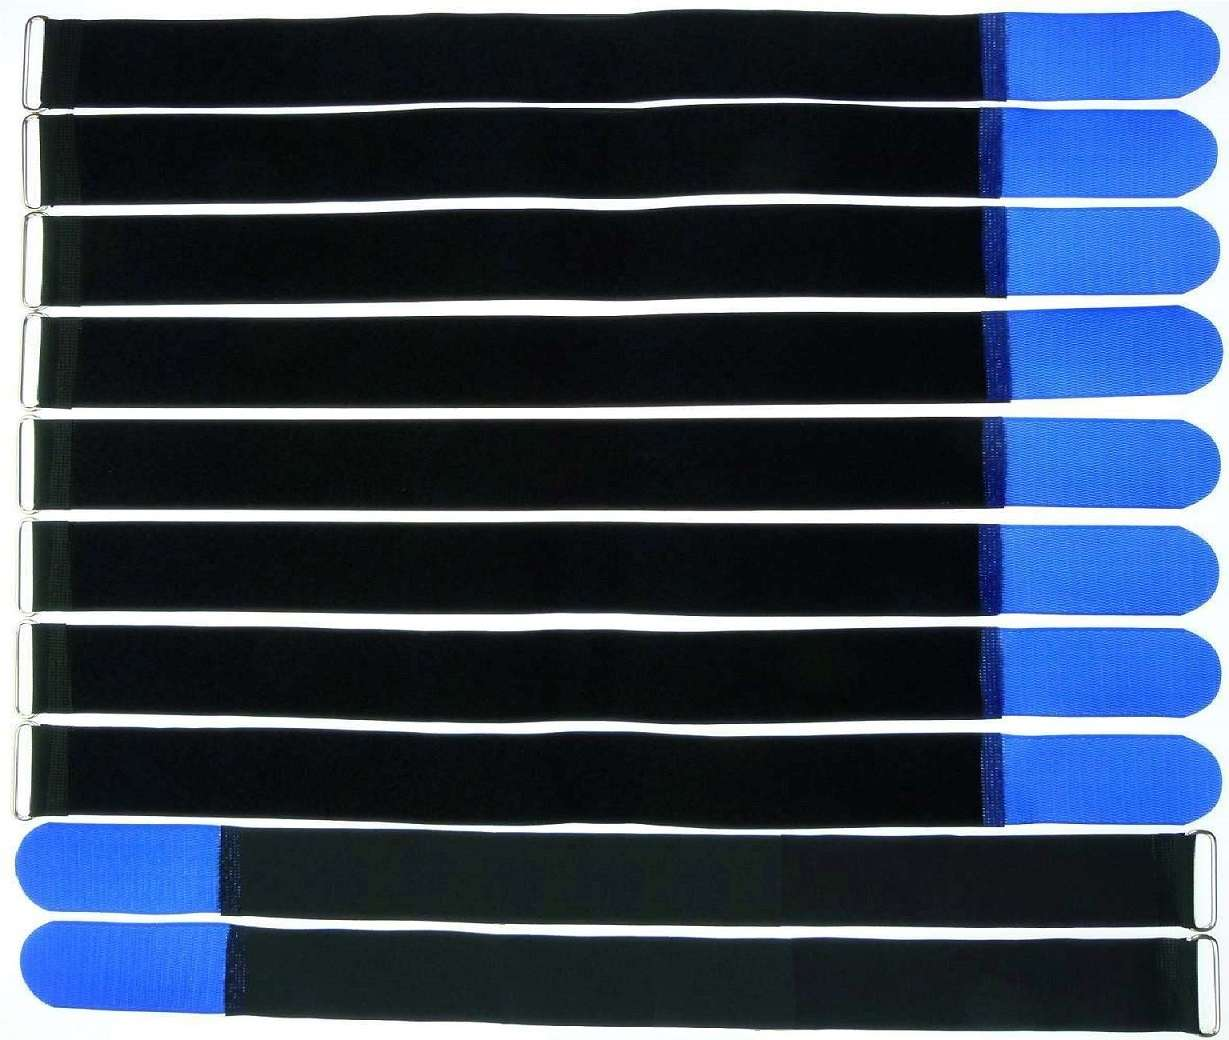 10 Klett Kabelbinder 800 x 50 mm blau Kabelklettband Kabelklett Klettband m Öse